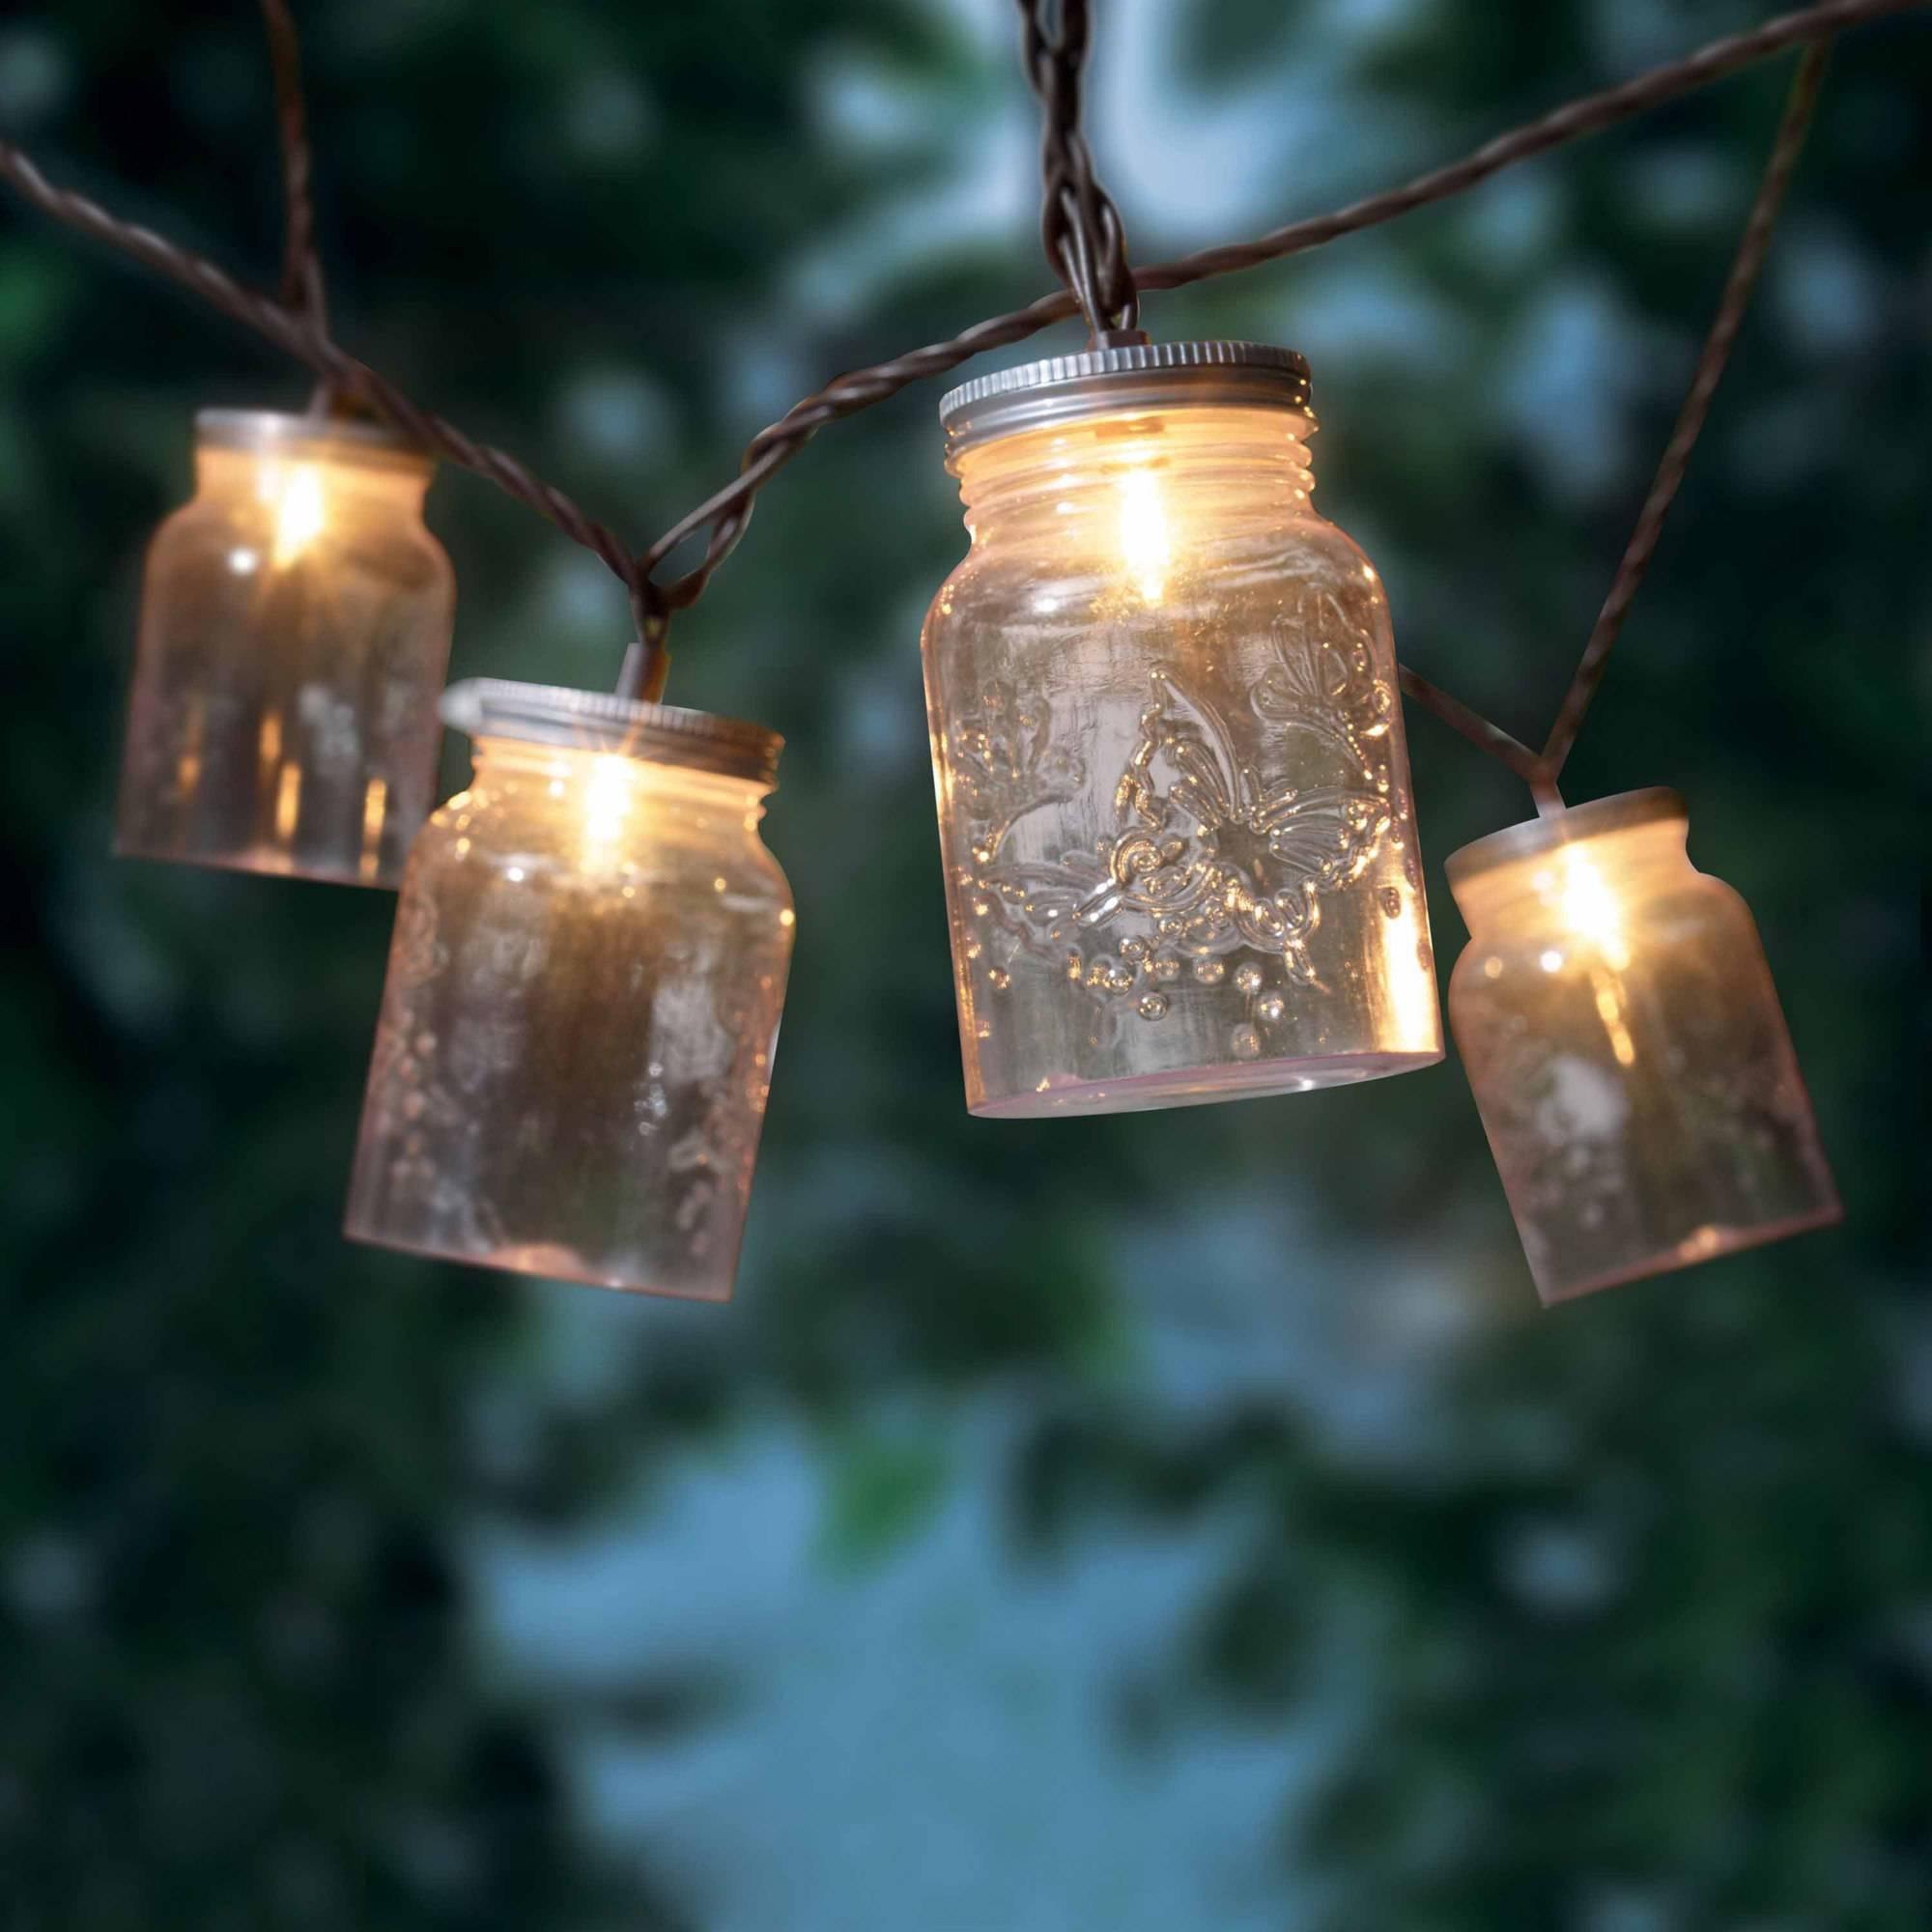 Outdoor Jar Lanterns For Preferred Mainstays Mason Jar Mini String Lights, 10 Count – Walmart (View 6 of 20)